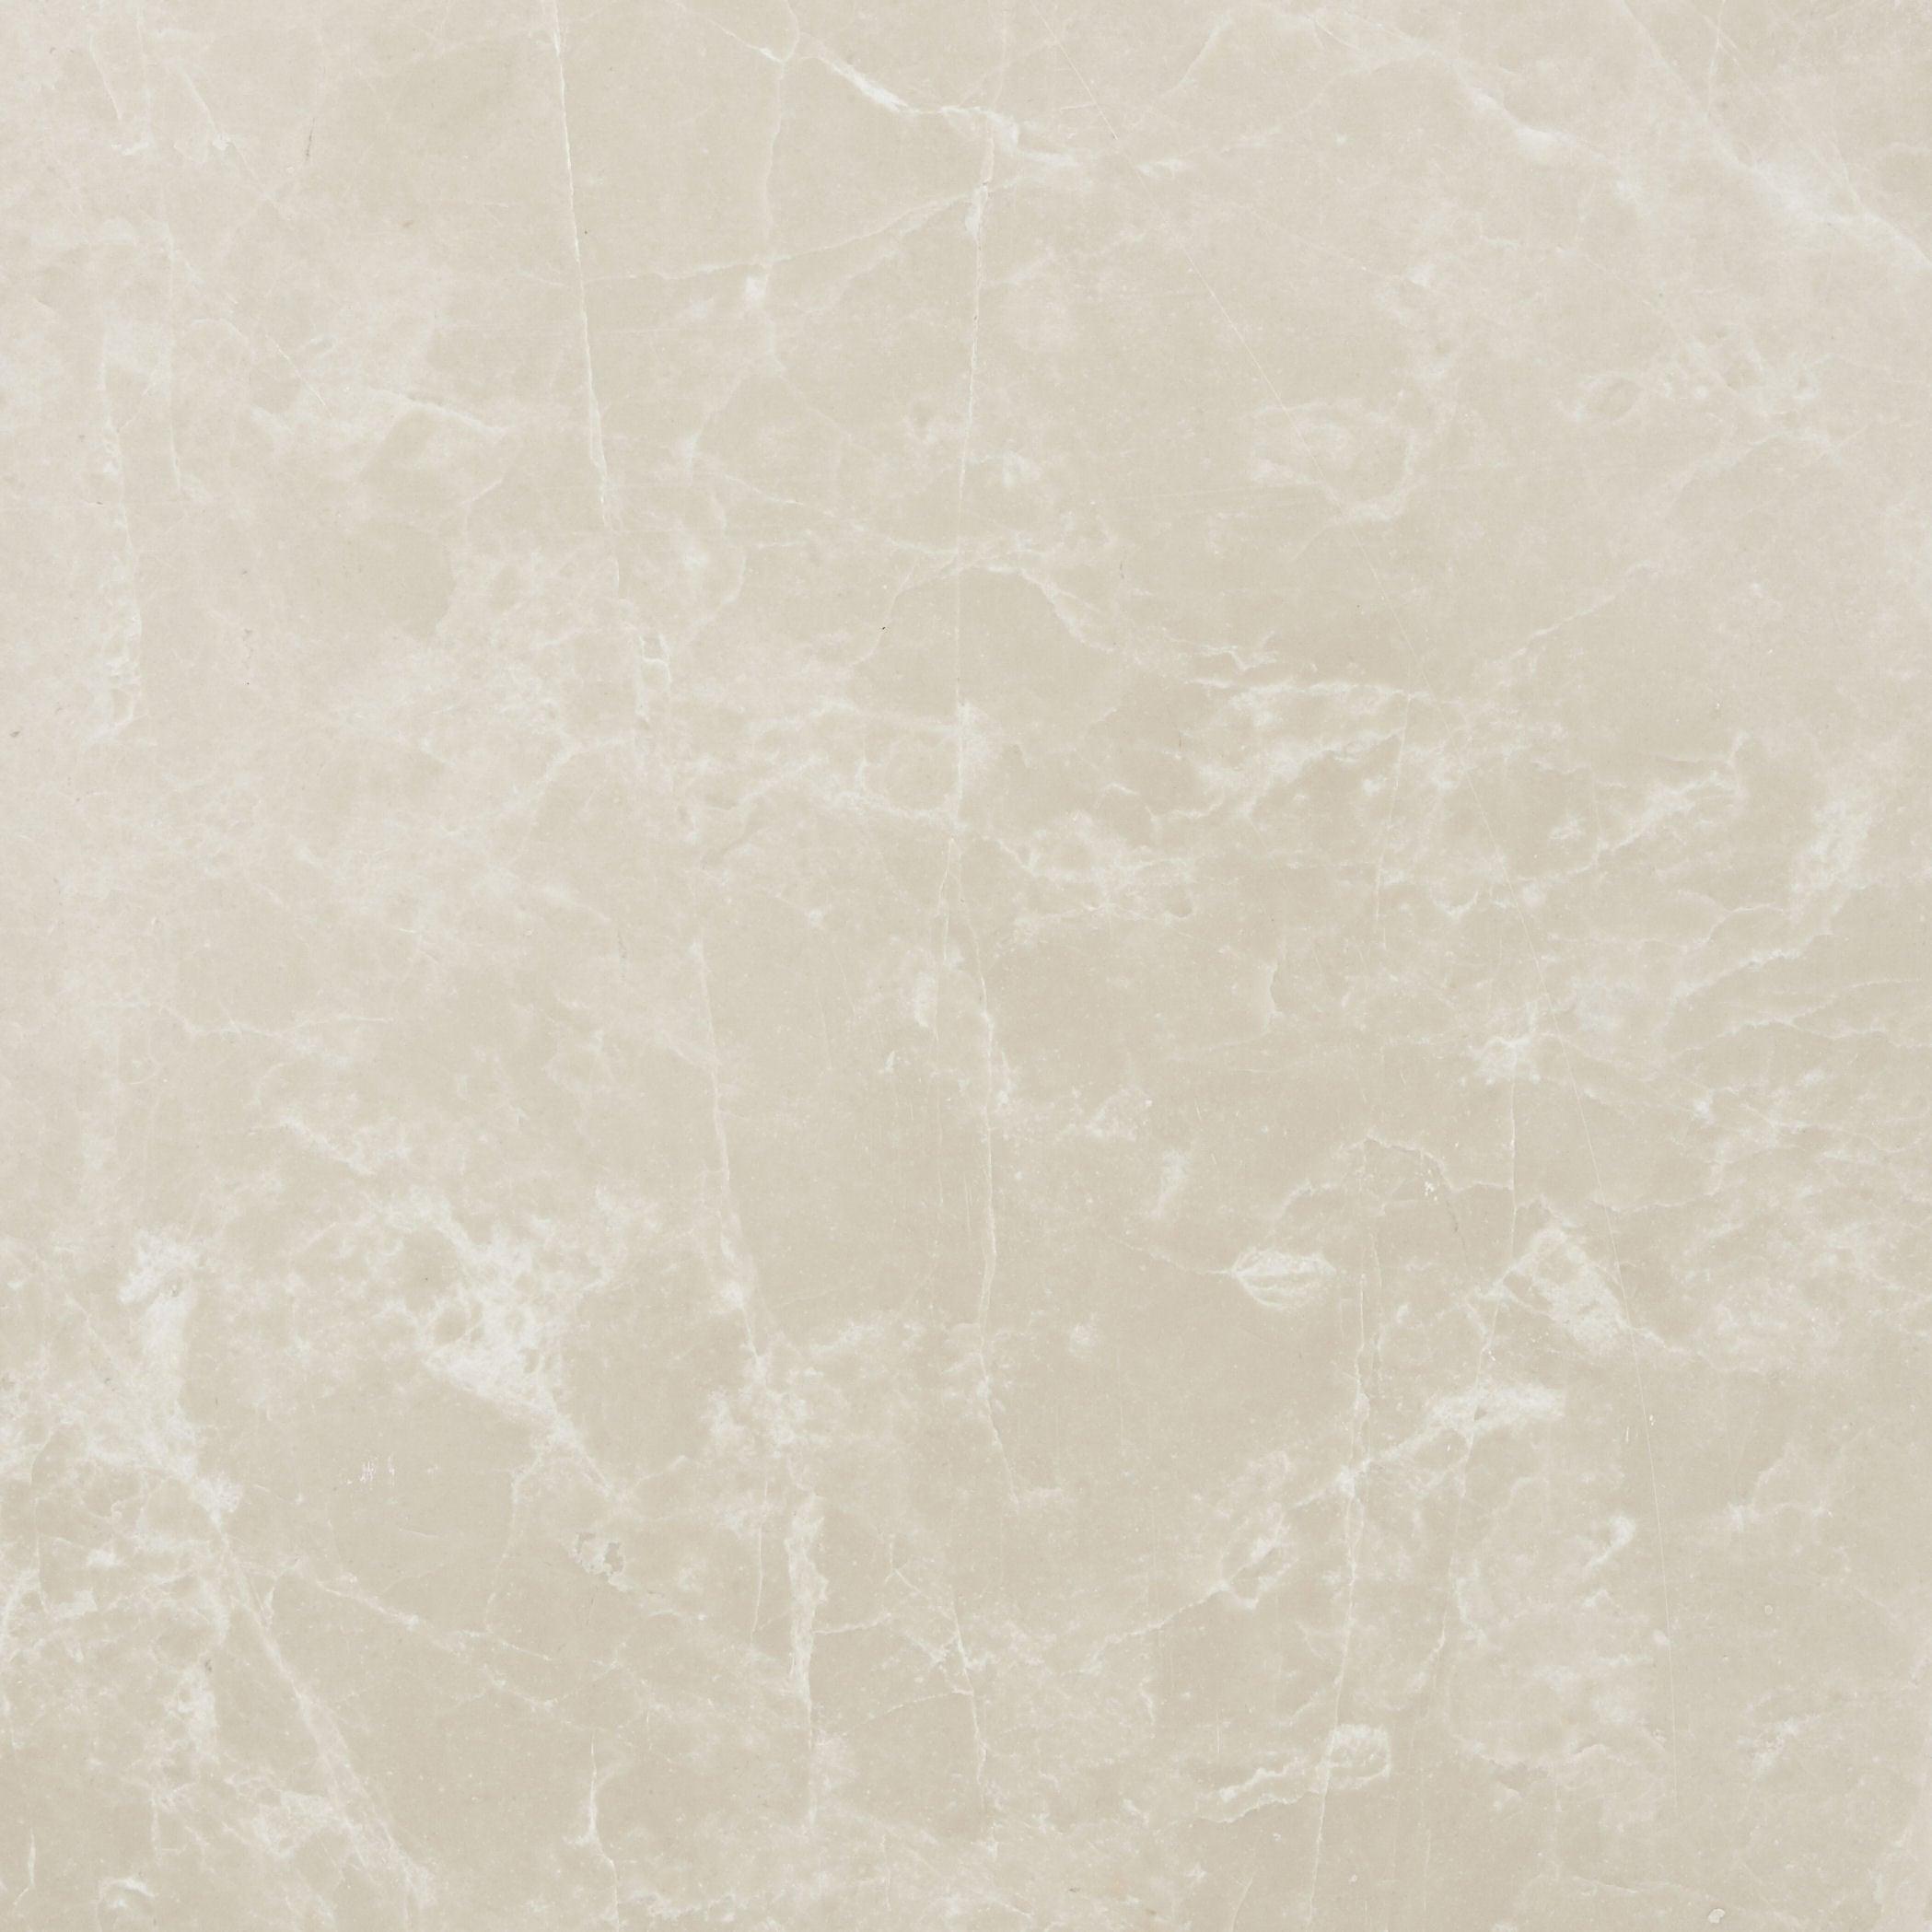 Marble tiles flooring mandarin stone belgravia honed marble dailygadgetfo Images